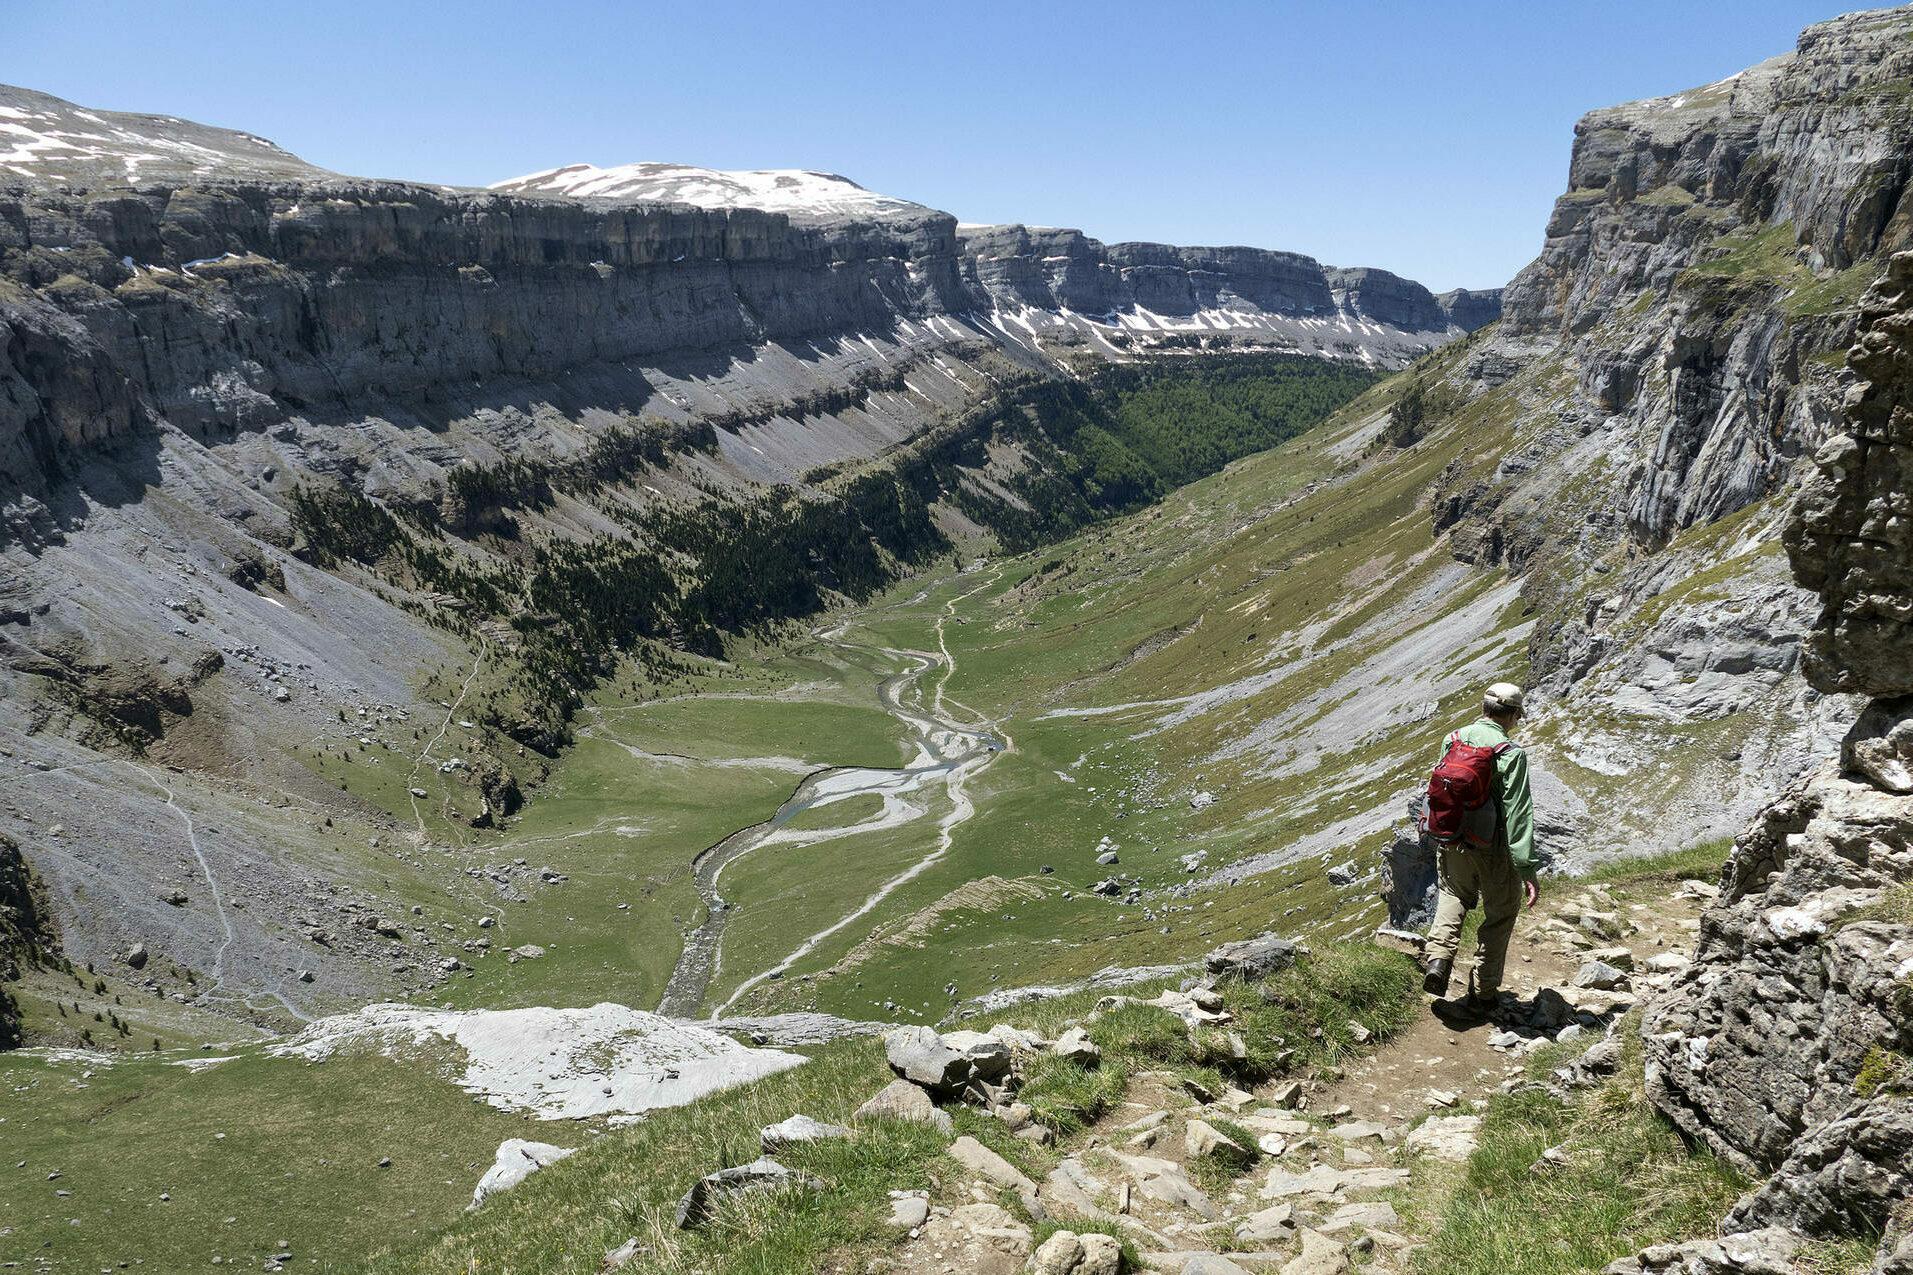 Spain pyrenees huesca ordesa circus arazas valley c diego pura aventura